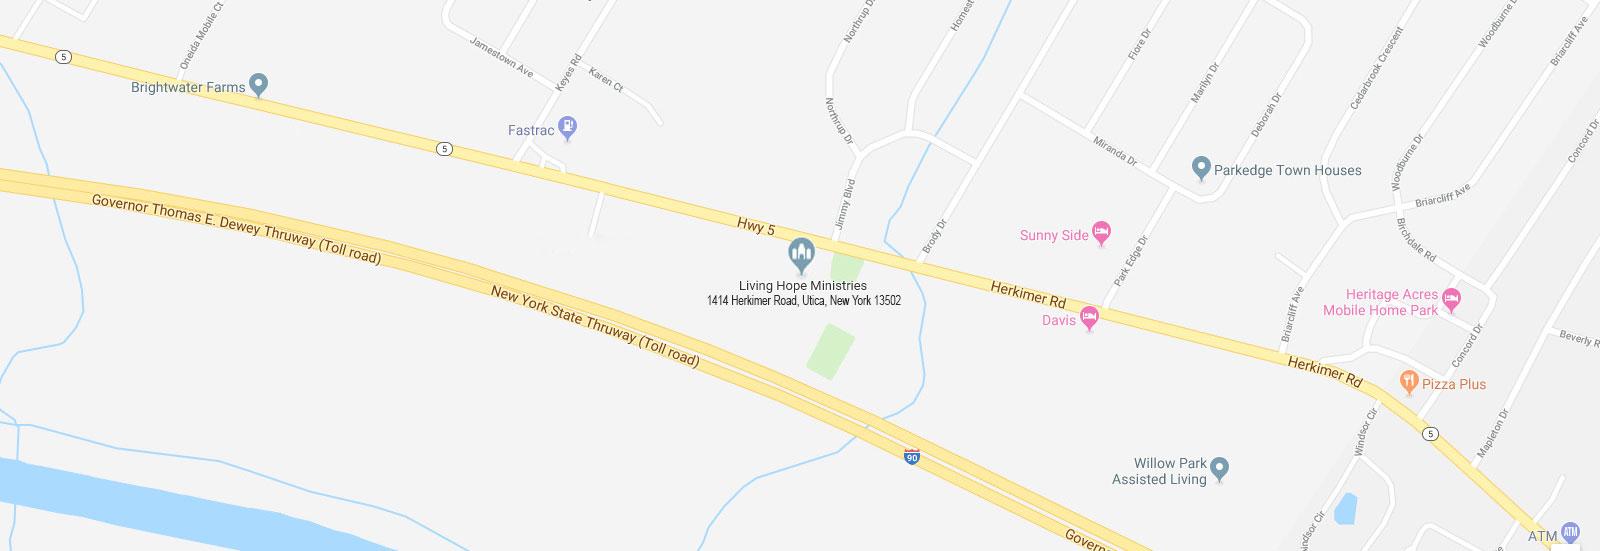 Living Hope Ministries Inc. 1414 Herkimer Road, Utica, New York 13502 Phone: 1-315-732-0123